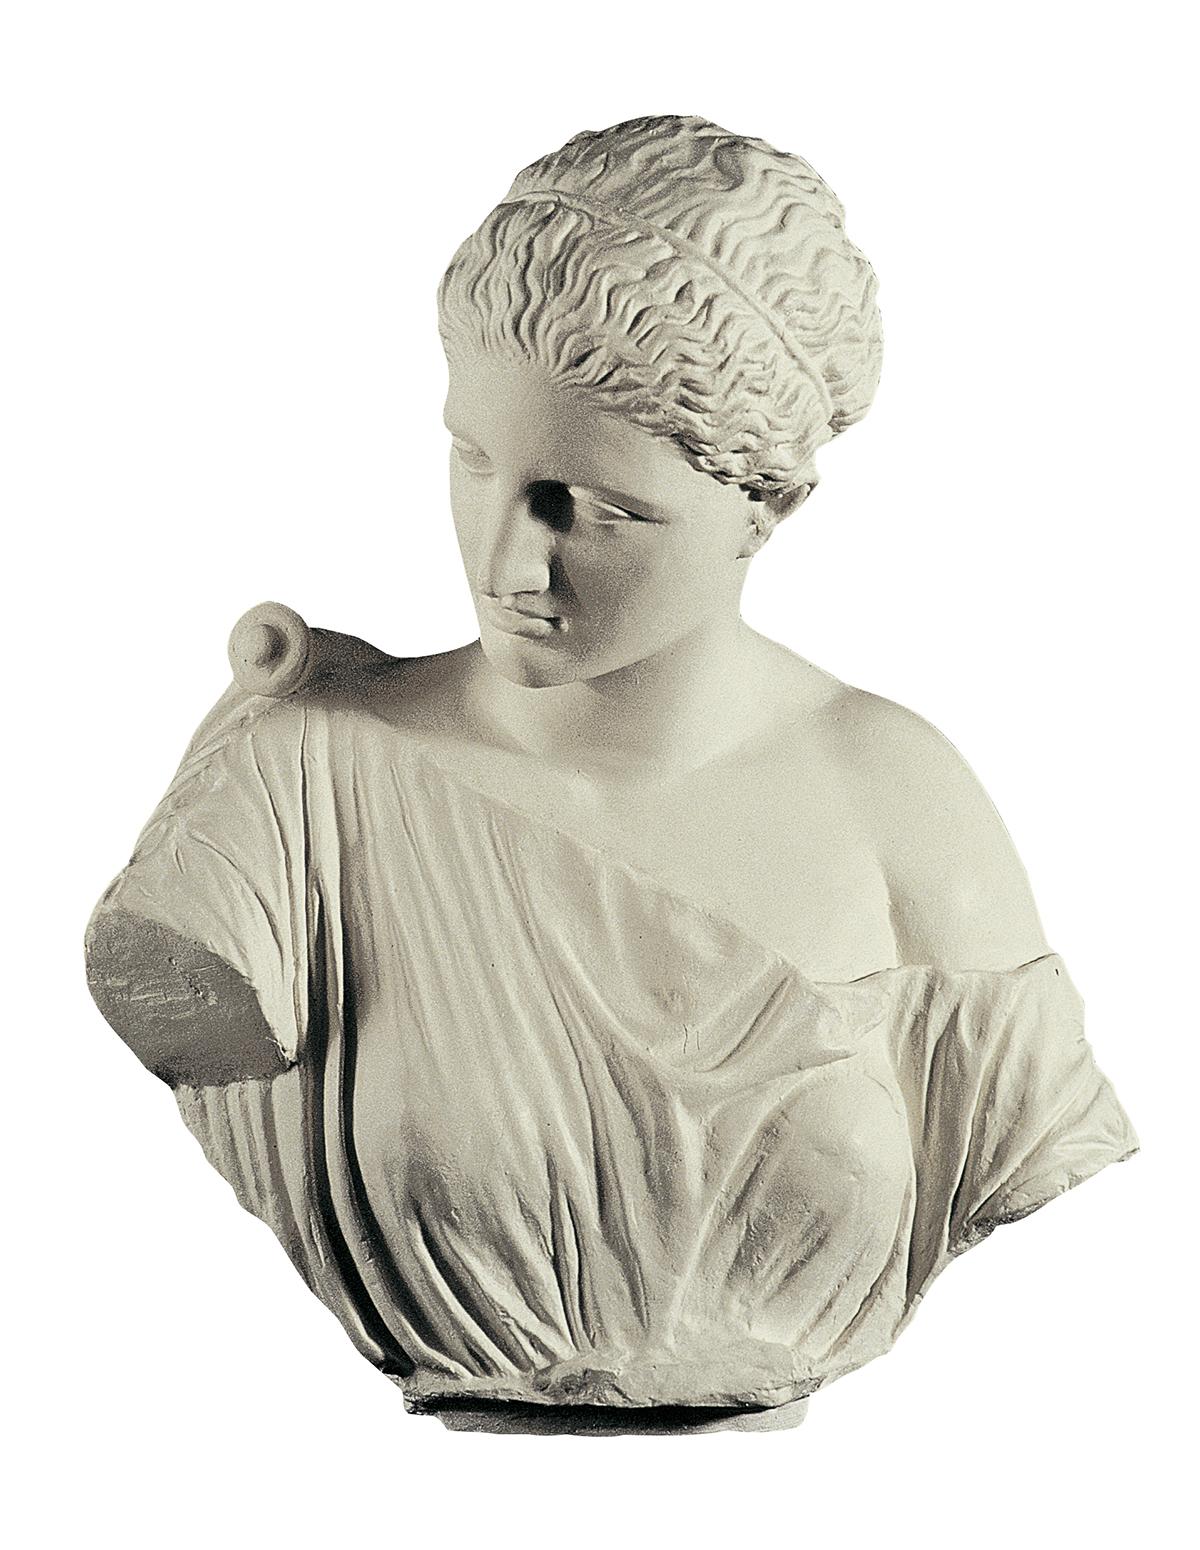 Presunta Artemide di Gabi, particolare del busto (copia in gesso)